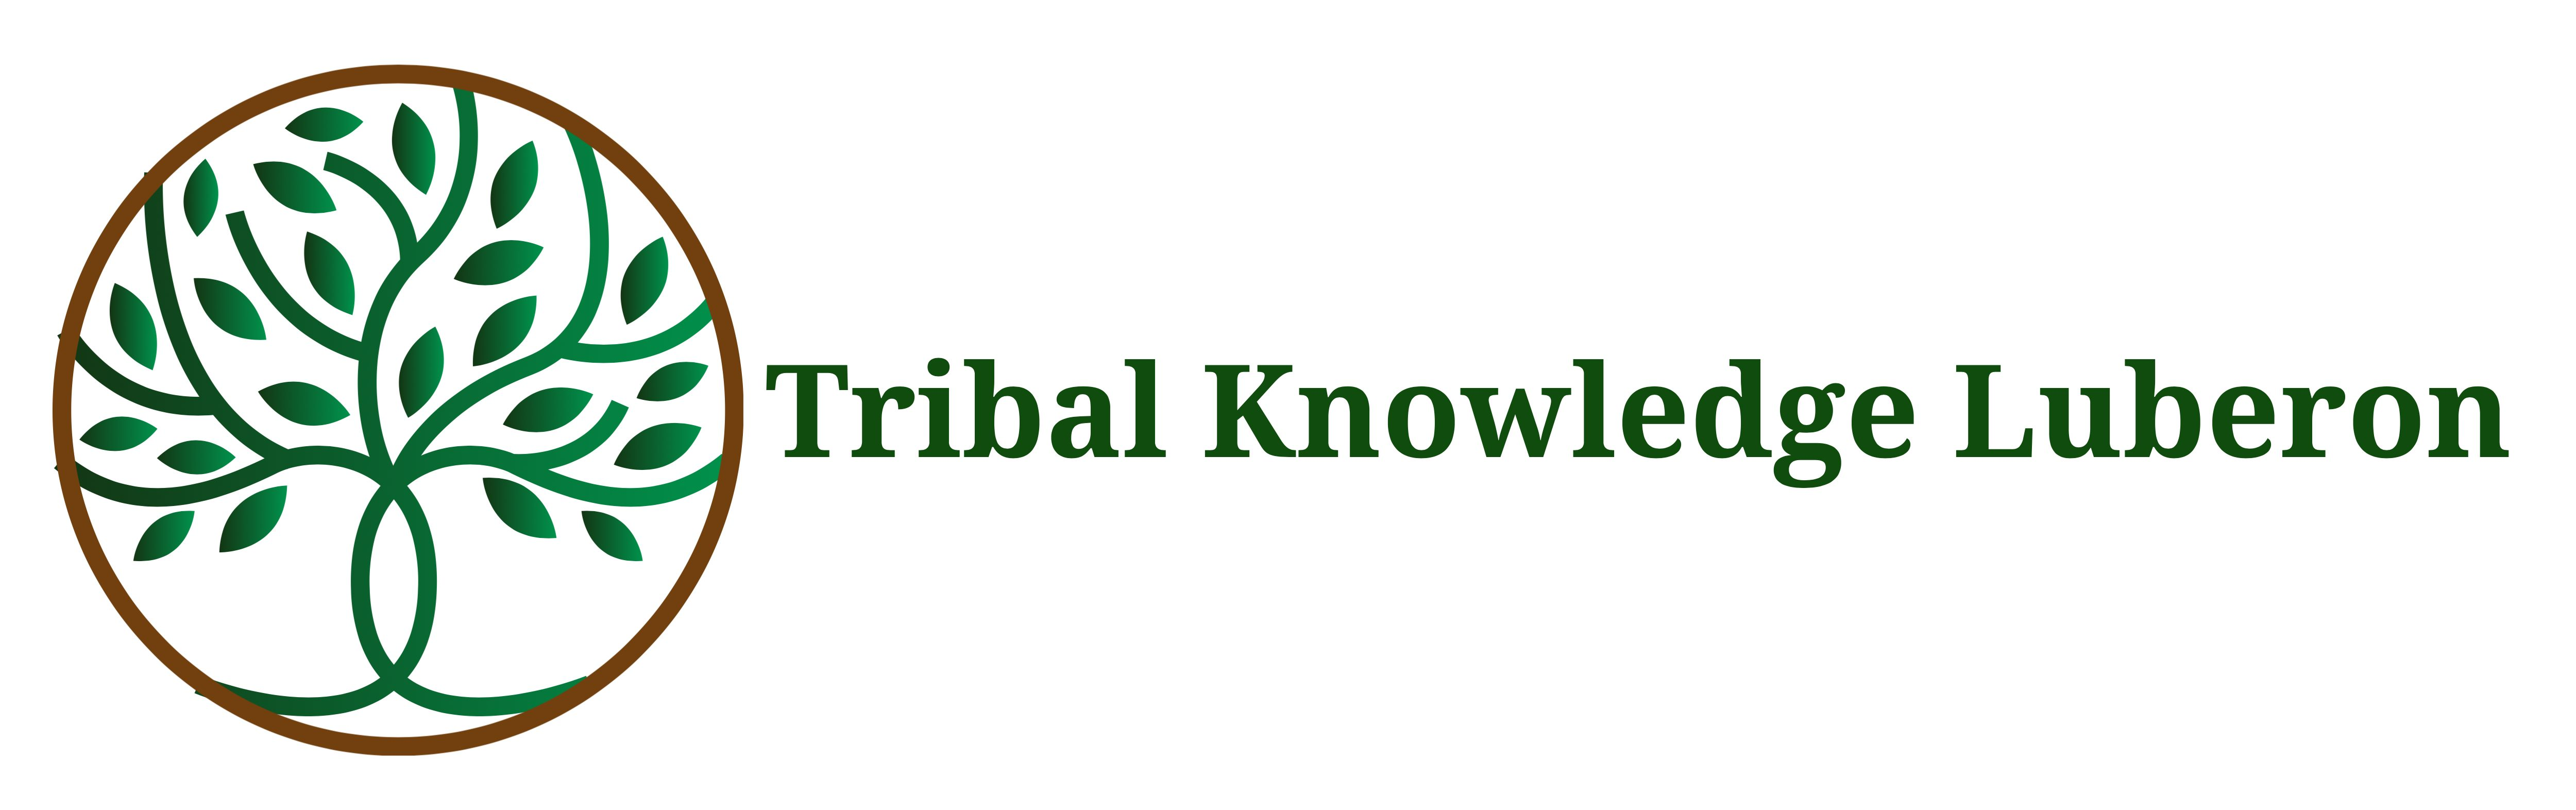 tribalknowledgeluberon.com